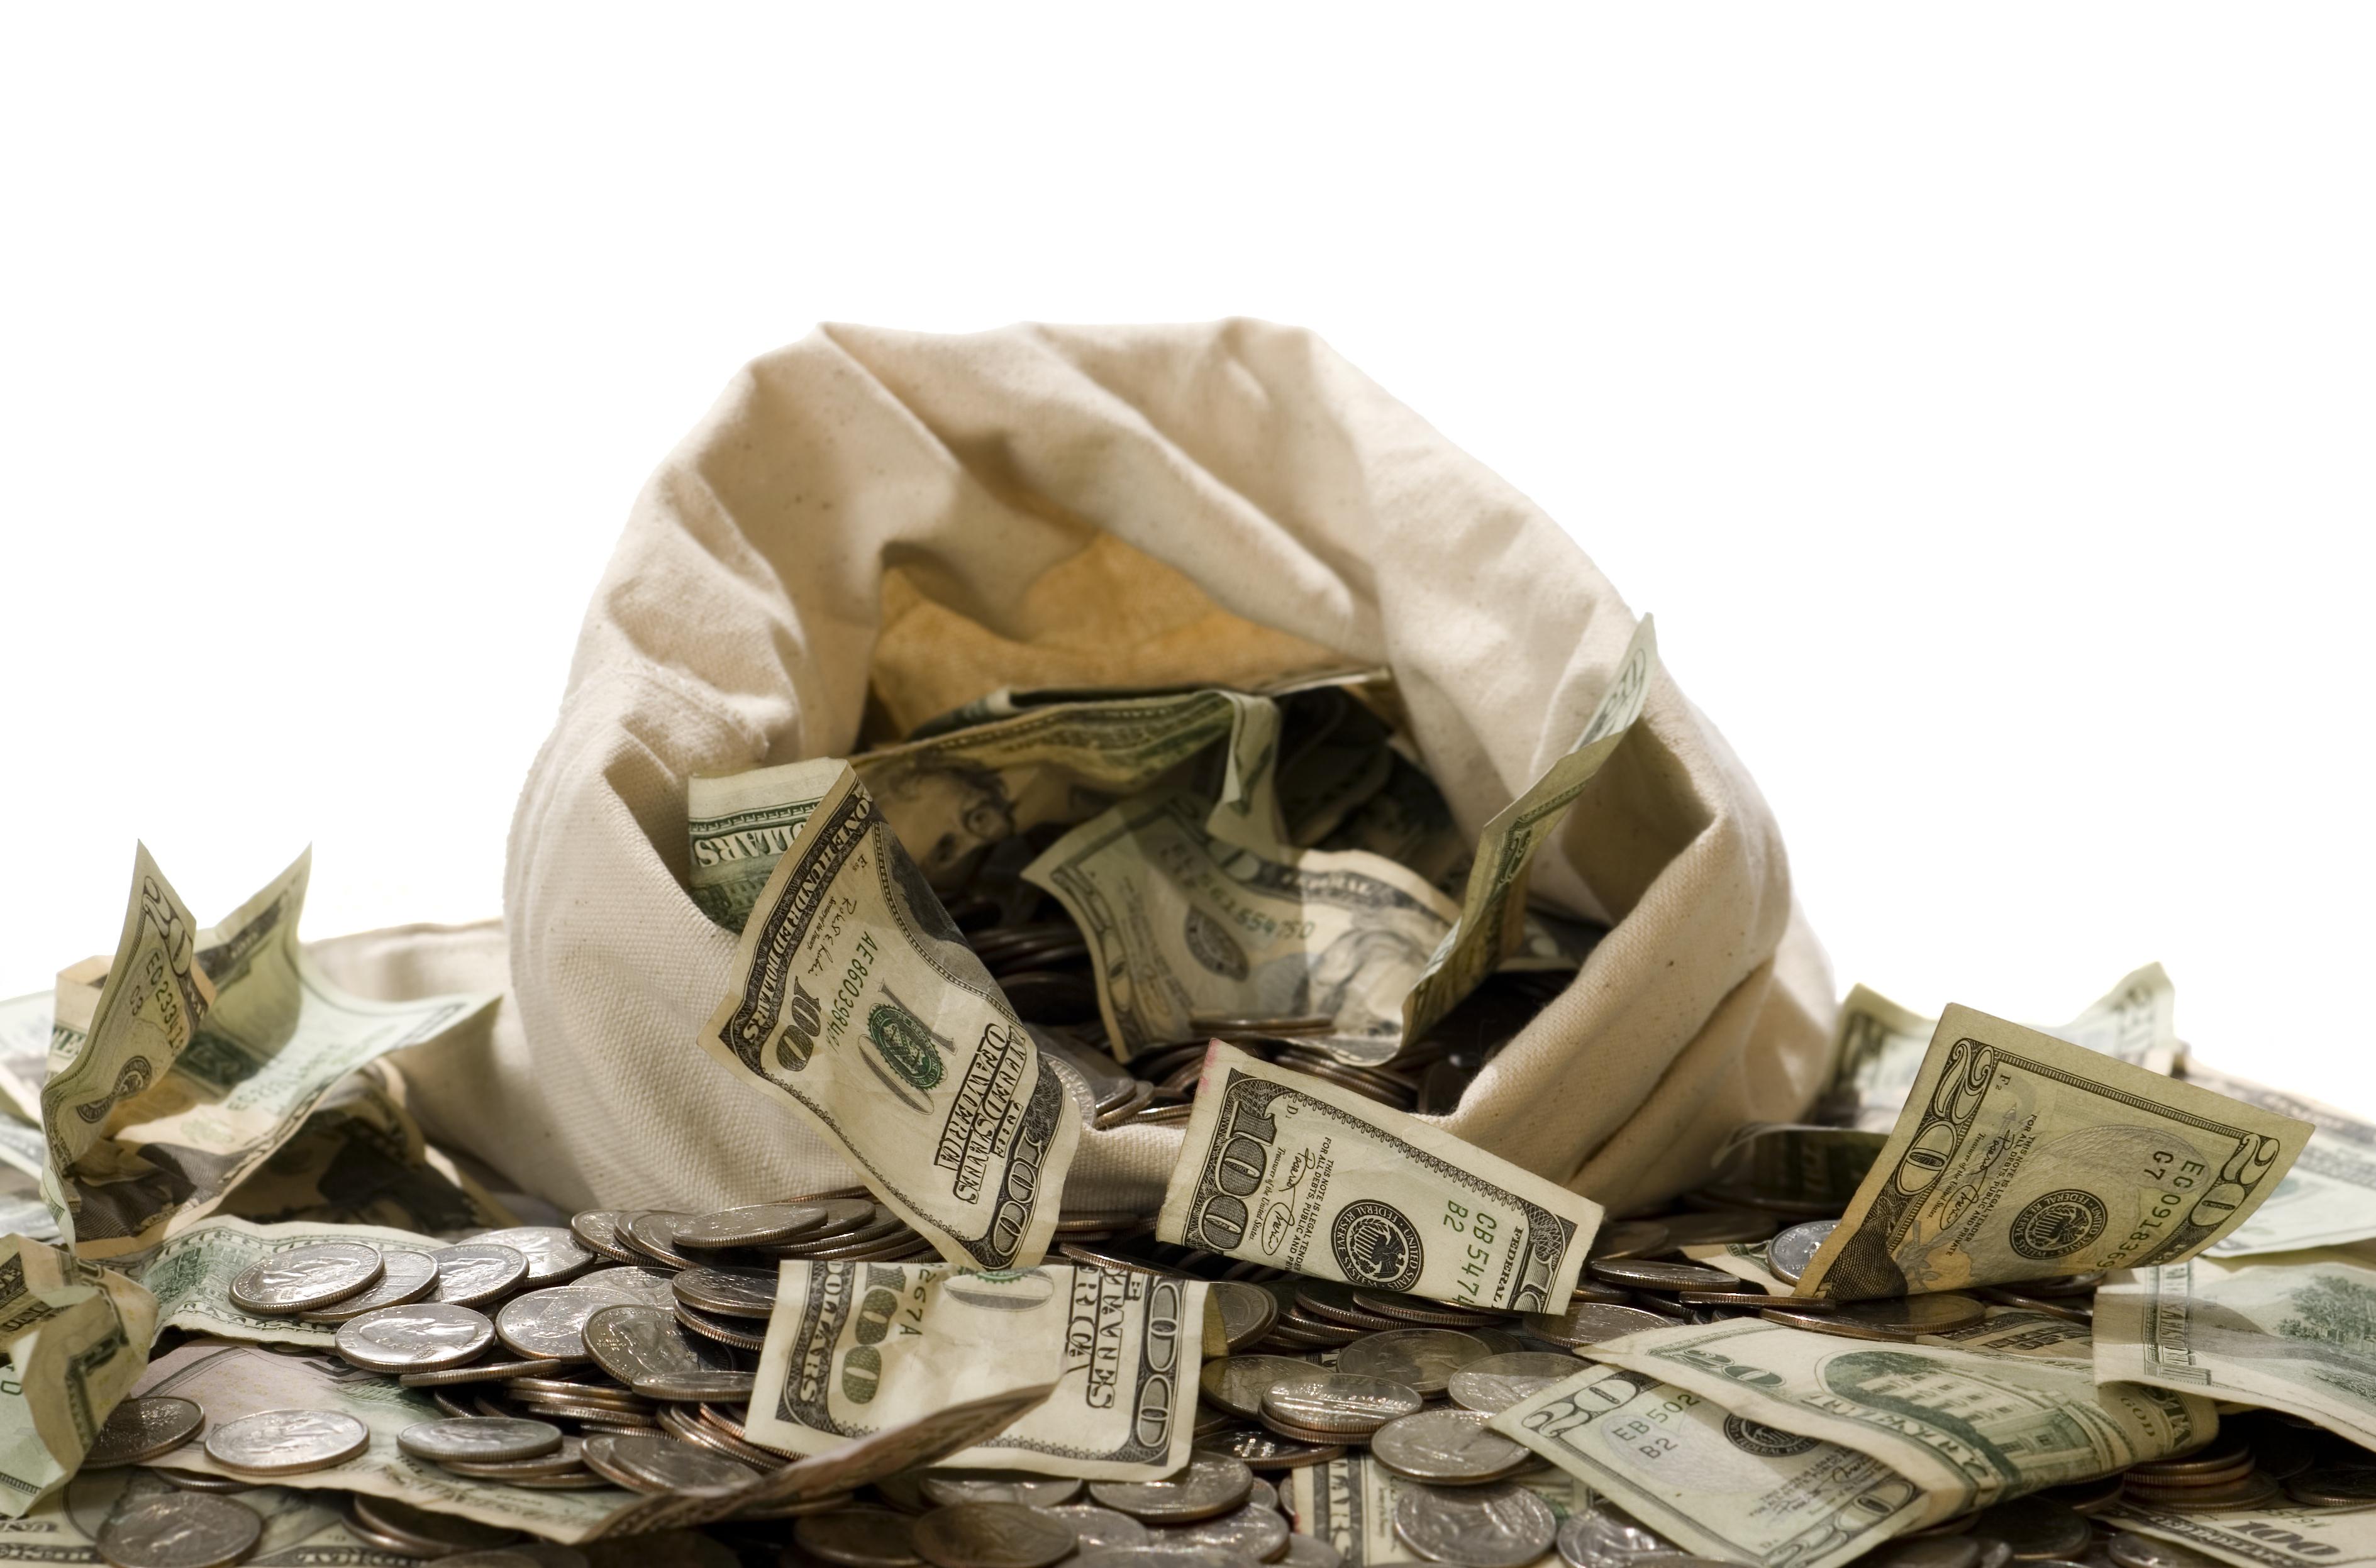 $100 bills spilling out of a money sack.